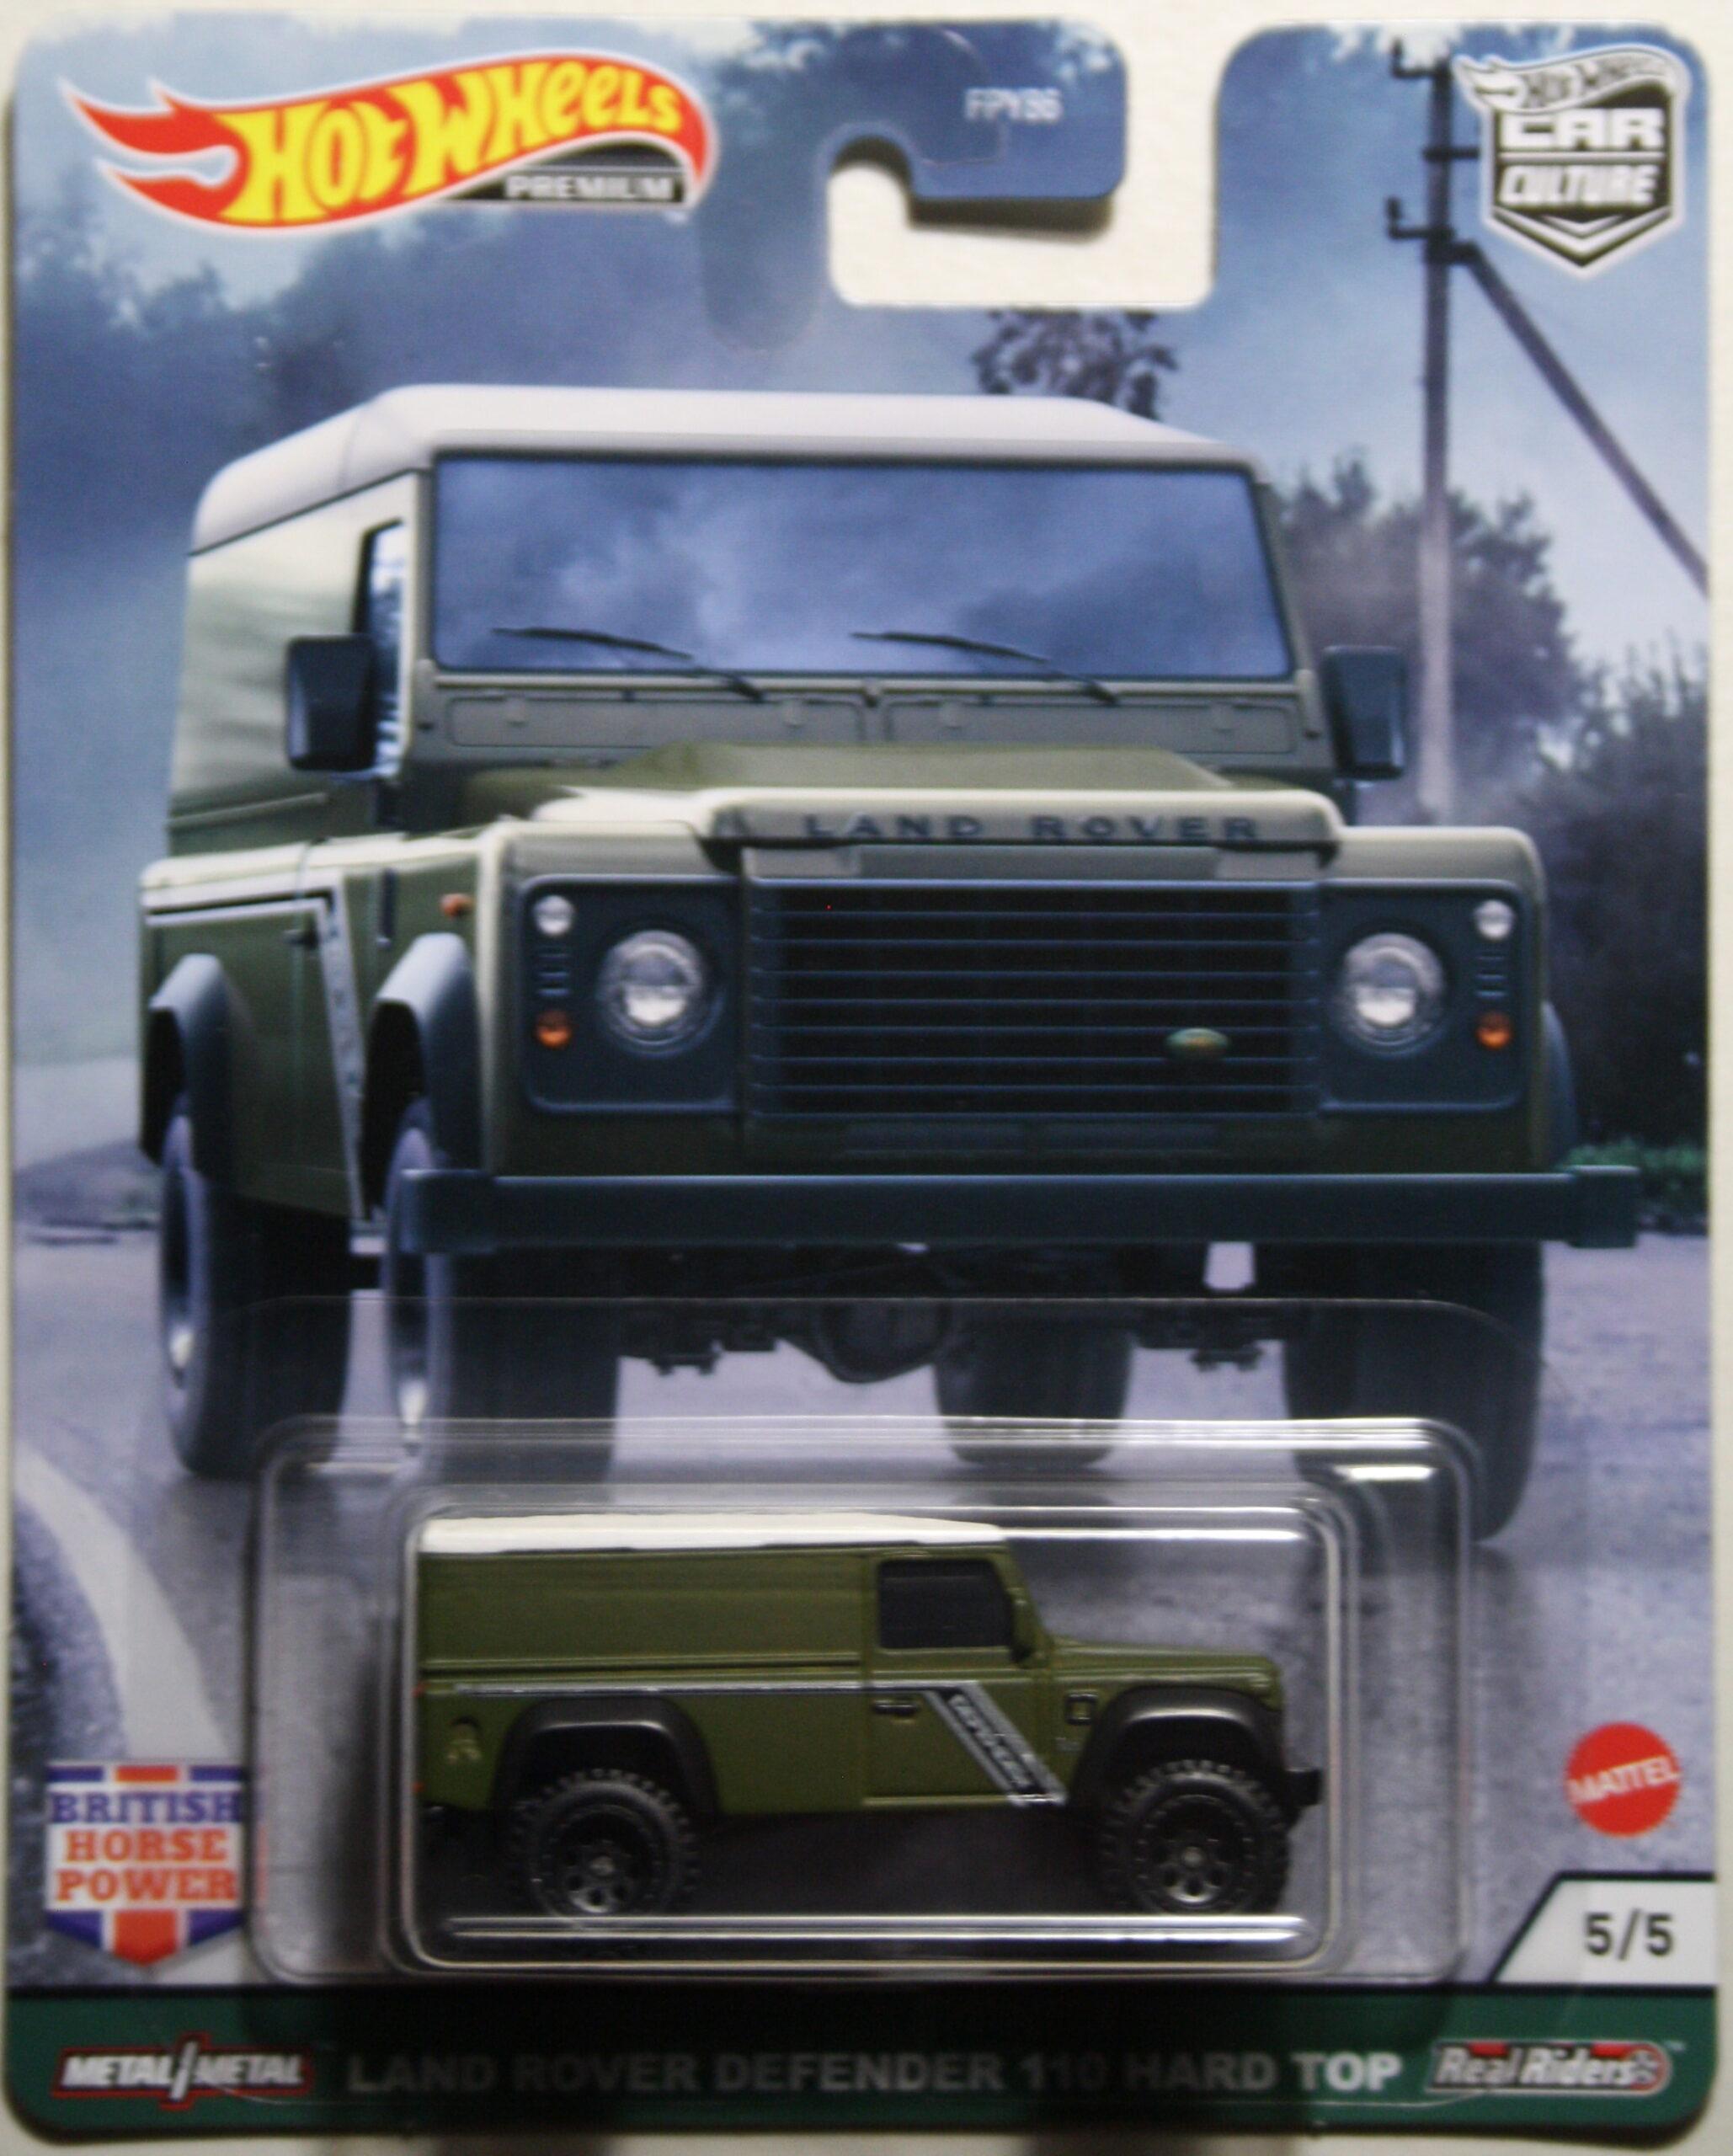 Hot Wheels Car Culture Land Rover Defender 110 Hard Top green